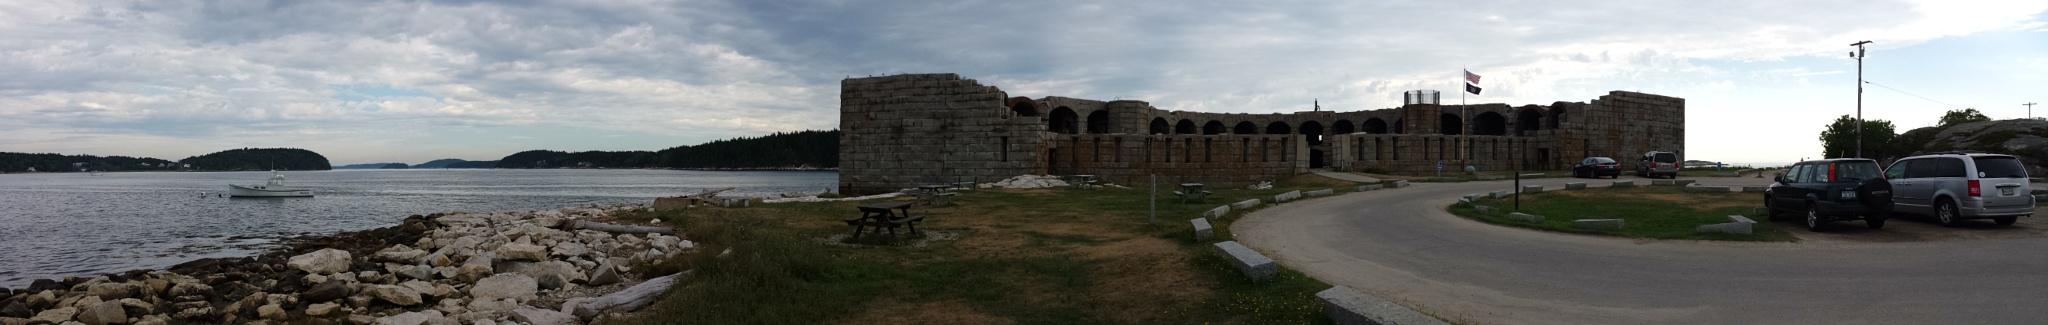 Fort Popham, Phippsburgh Maine  by Cindy